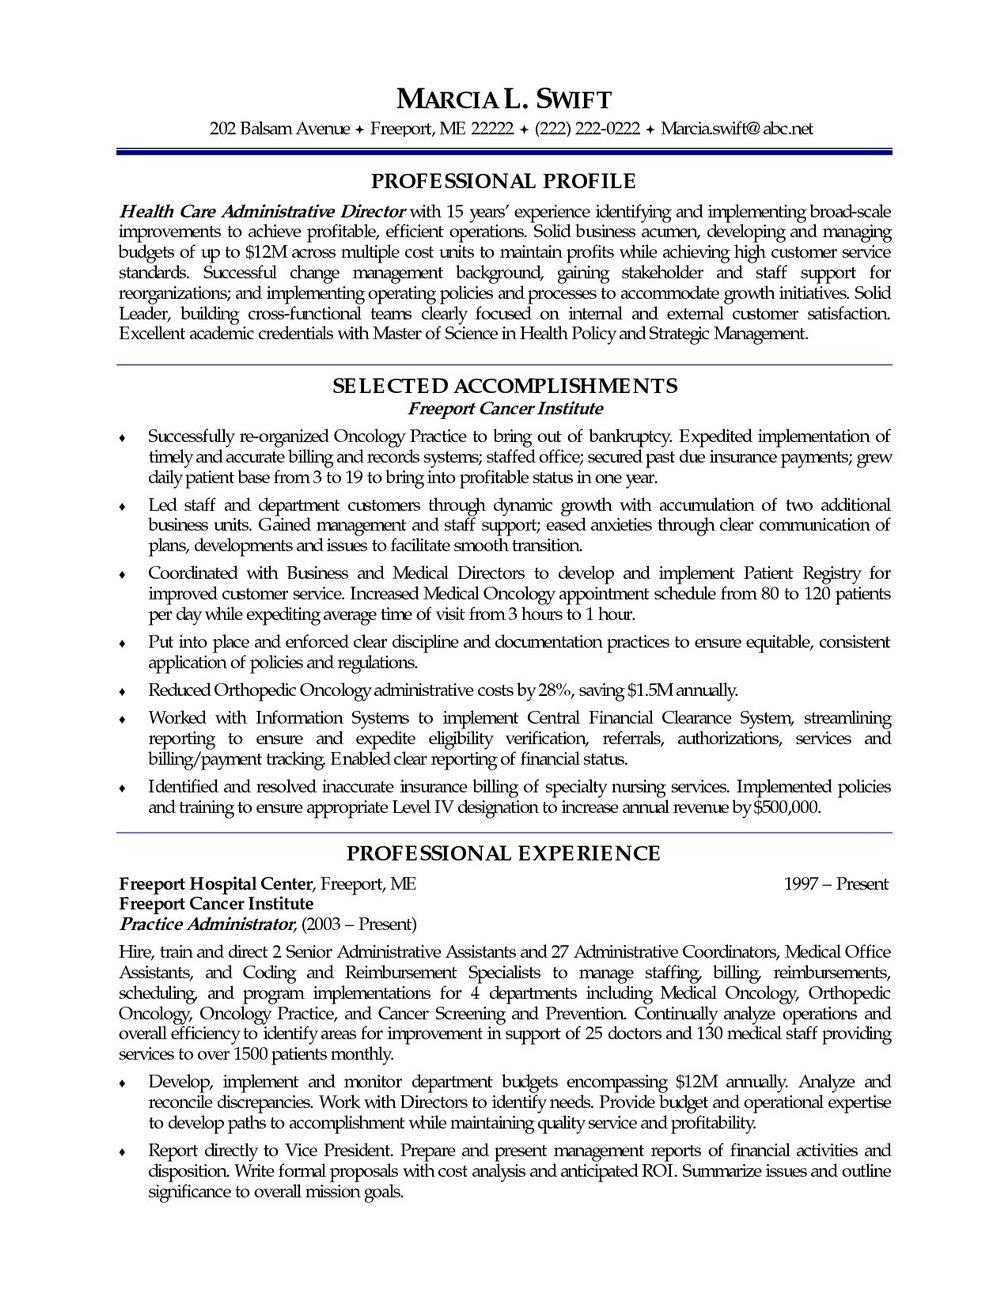 Free Download Sample Resume In Word Format